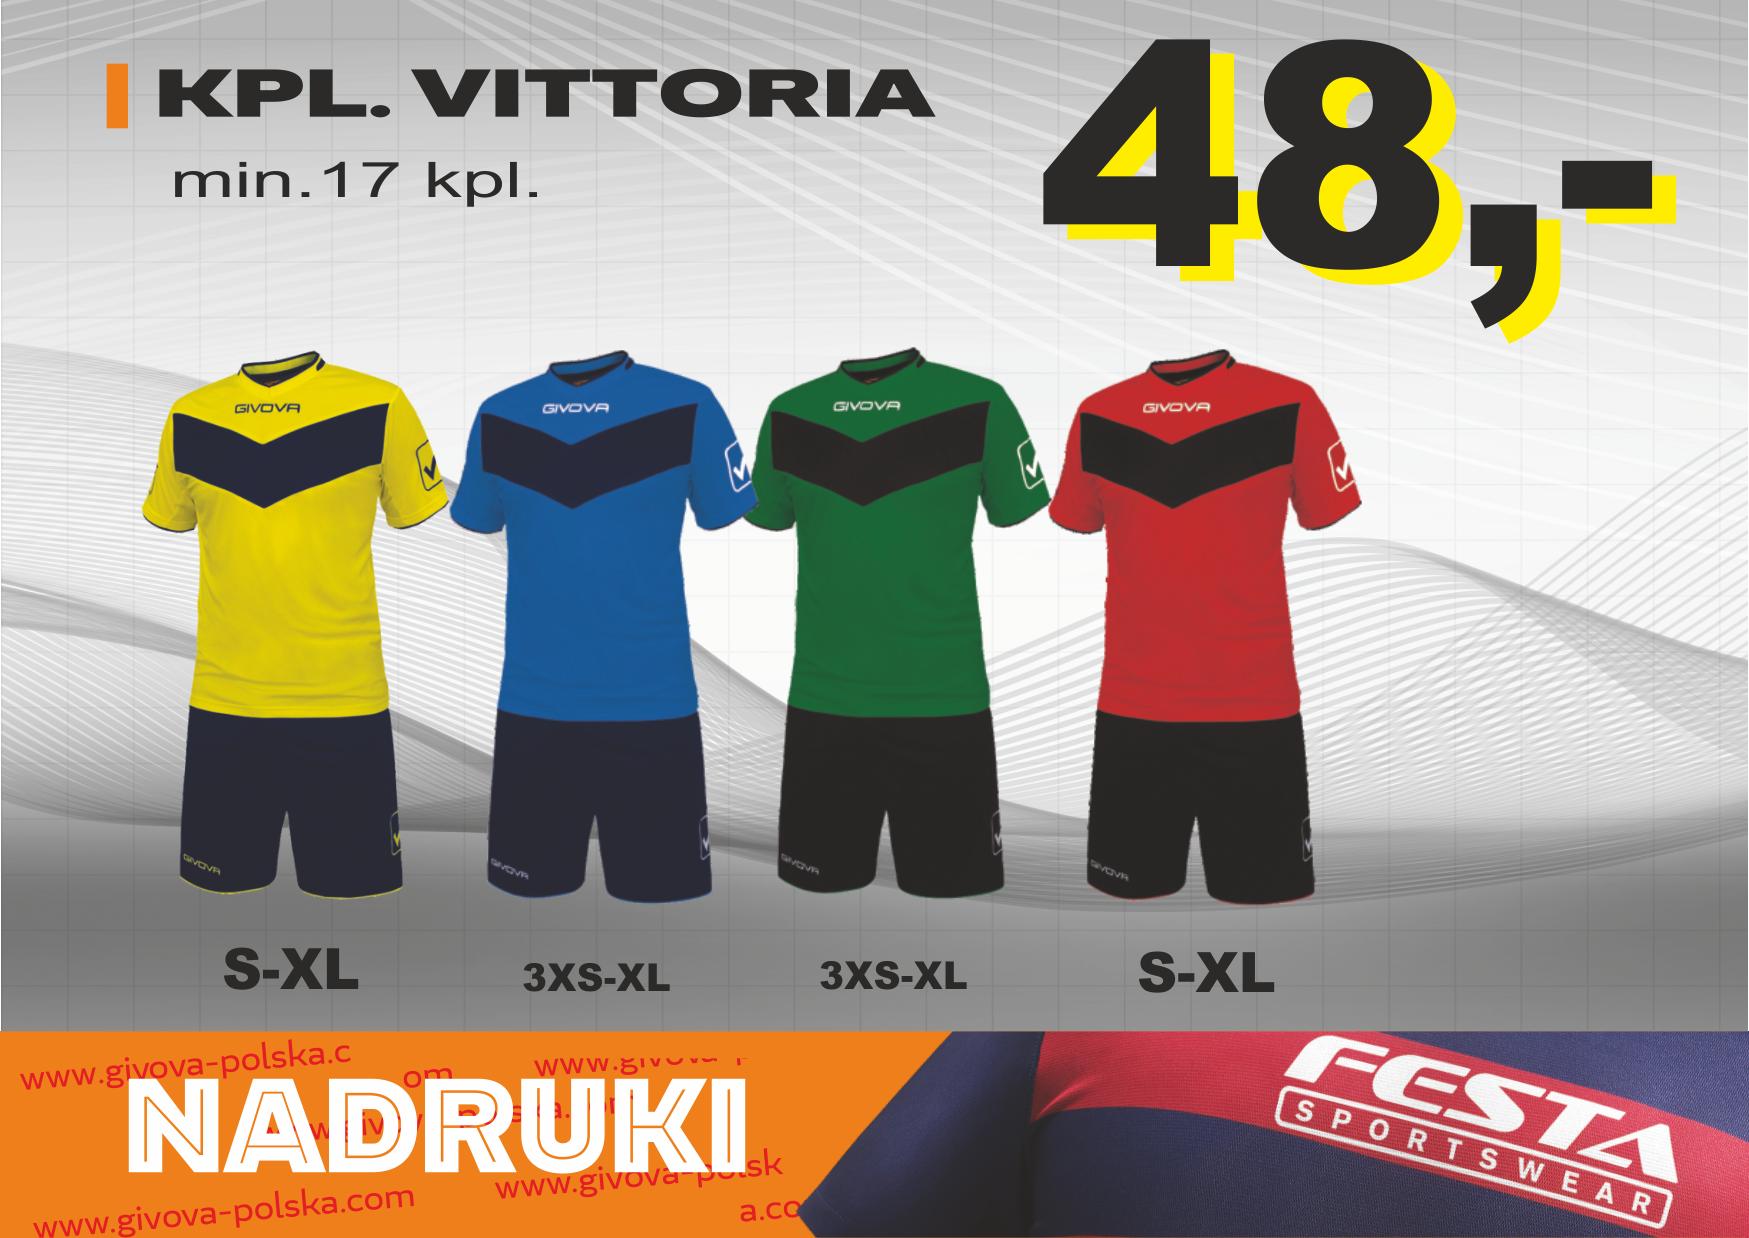 vittoria 48 zł